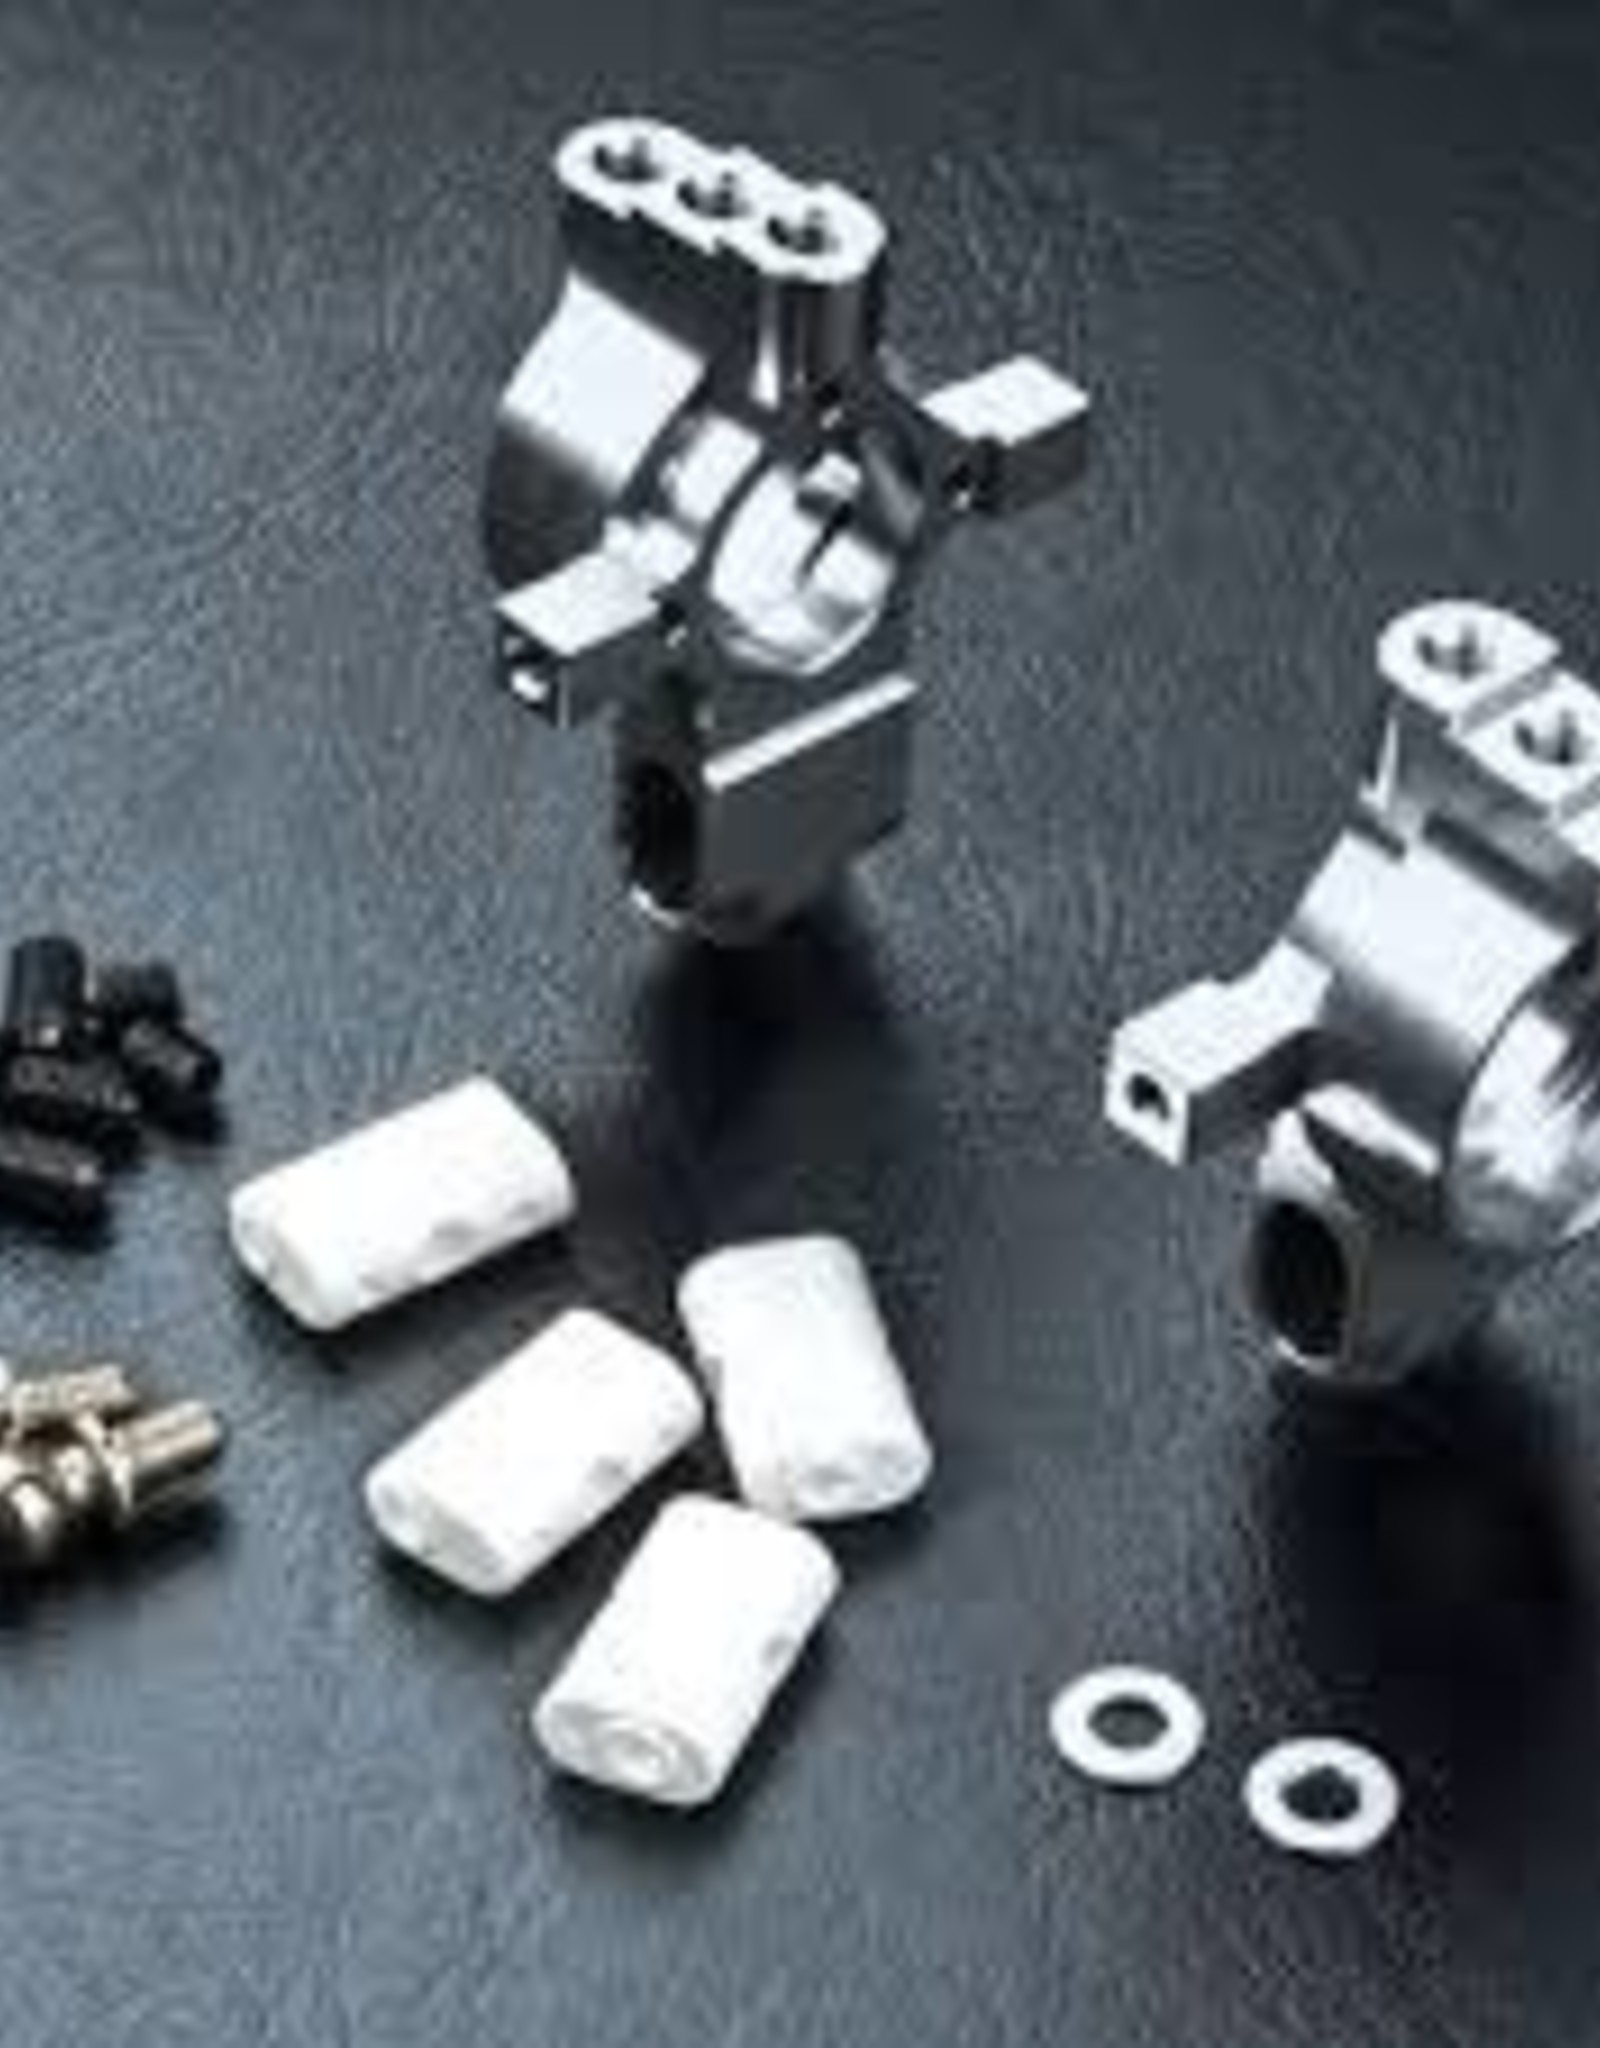 MST MXSPD210354S MST FXX HT Aluminum Rear Upright Set Silver 210354S